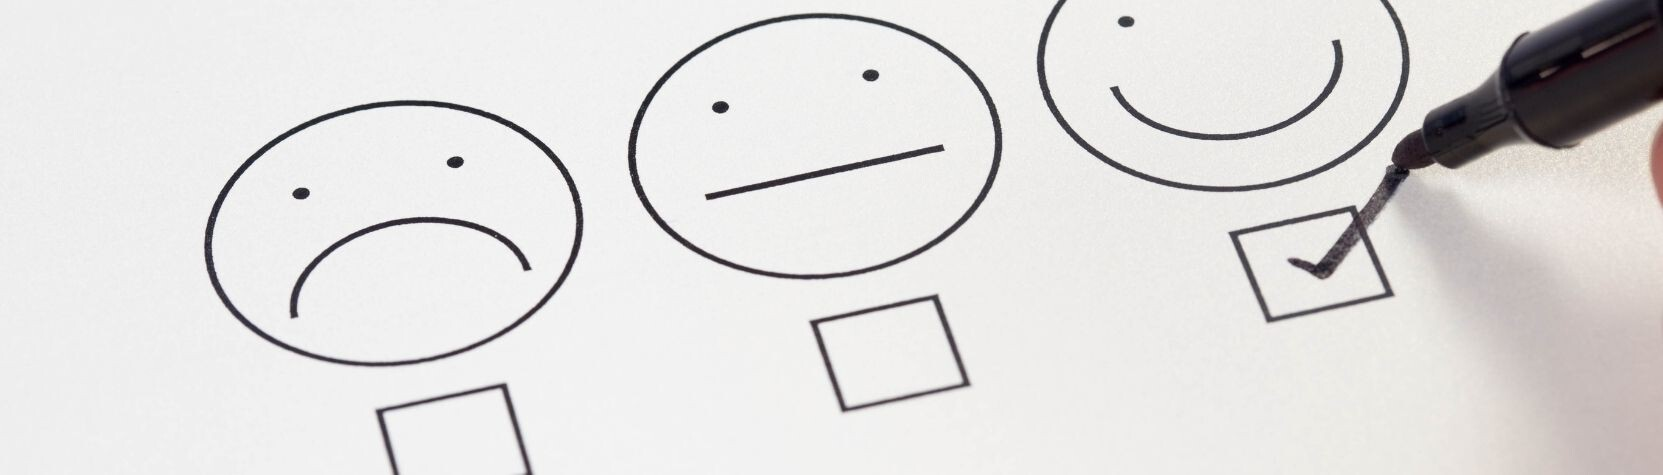 Vds training consultancy blog feedback geven